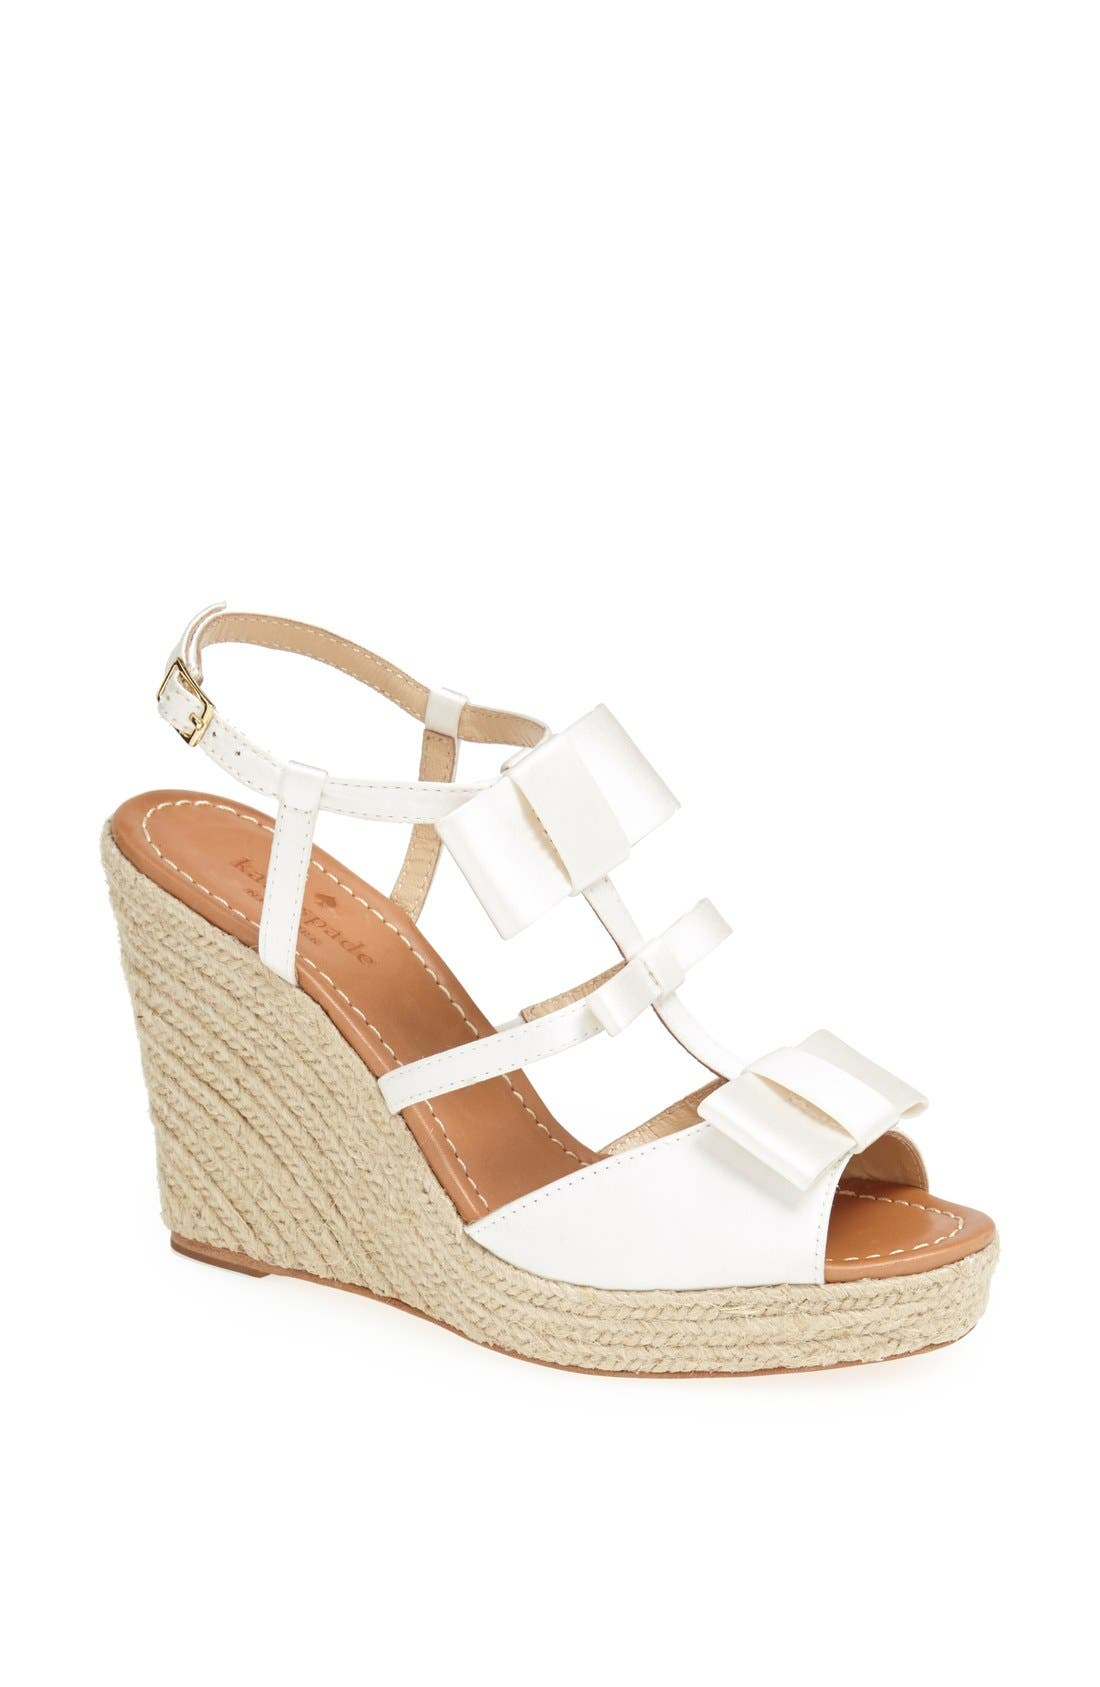 Alternate Image 1 Selected - kate spade new york 'juju' wedge sandal